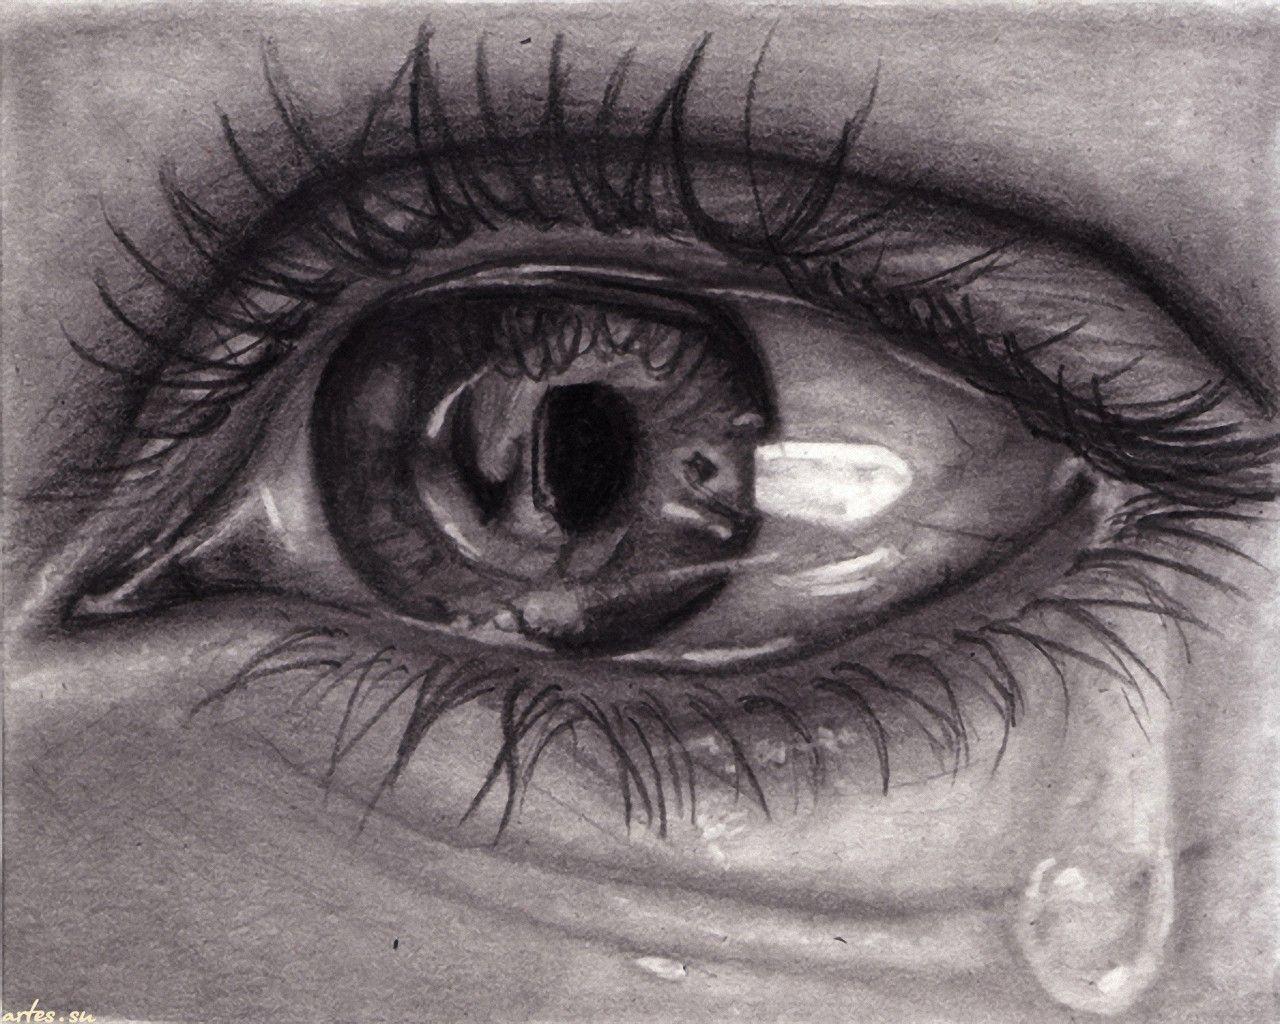 Drawing A Teardrop: Crying Eye Drawing, How